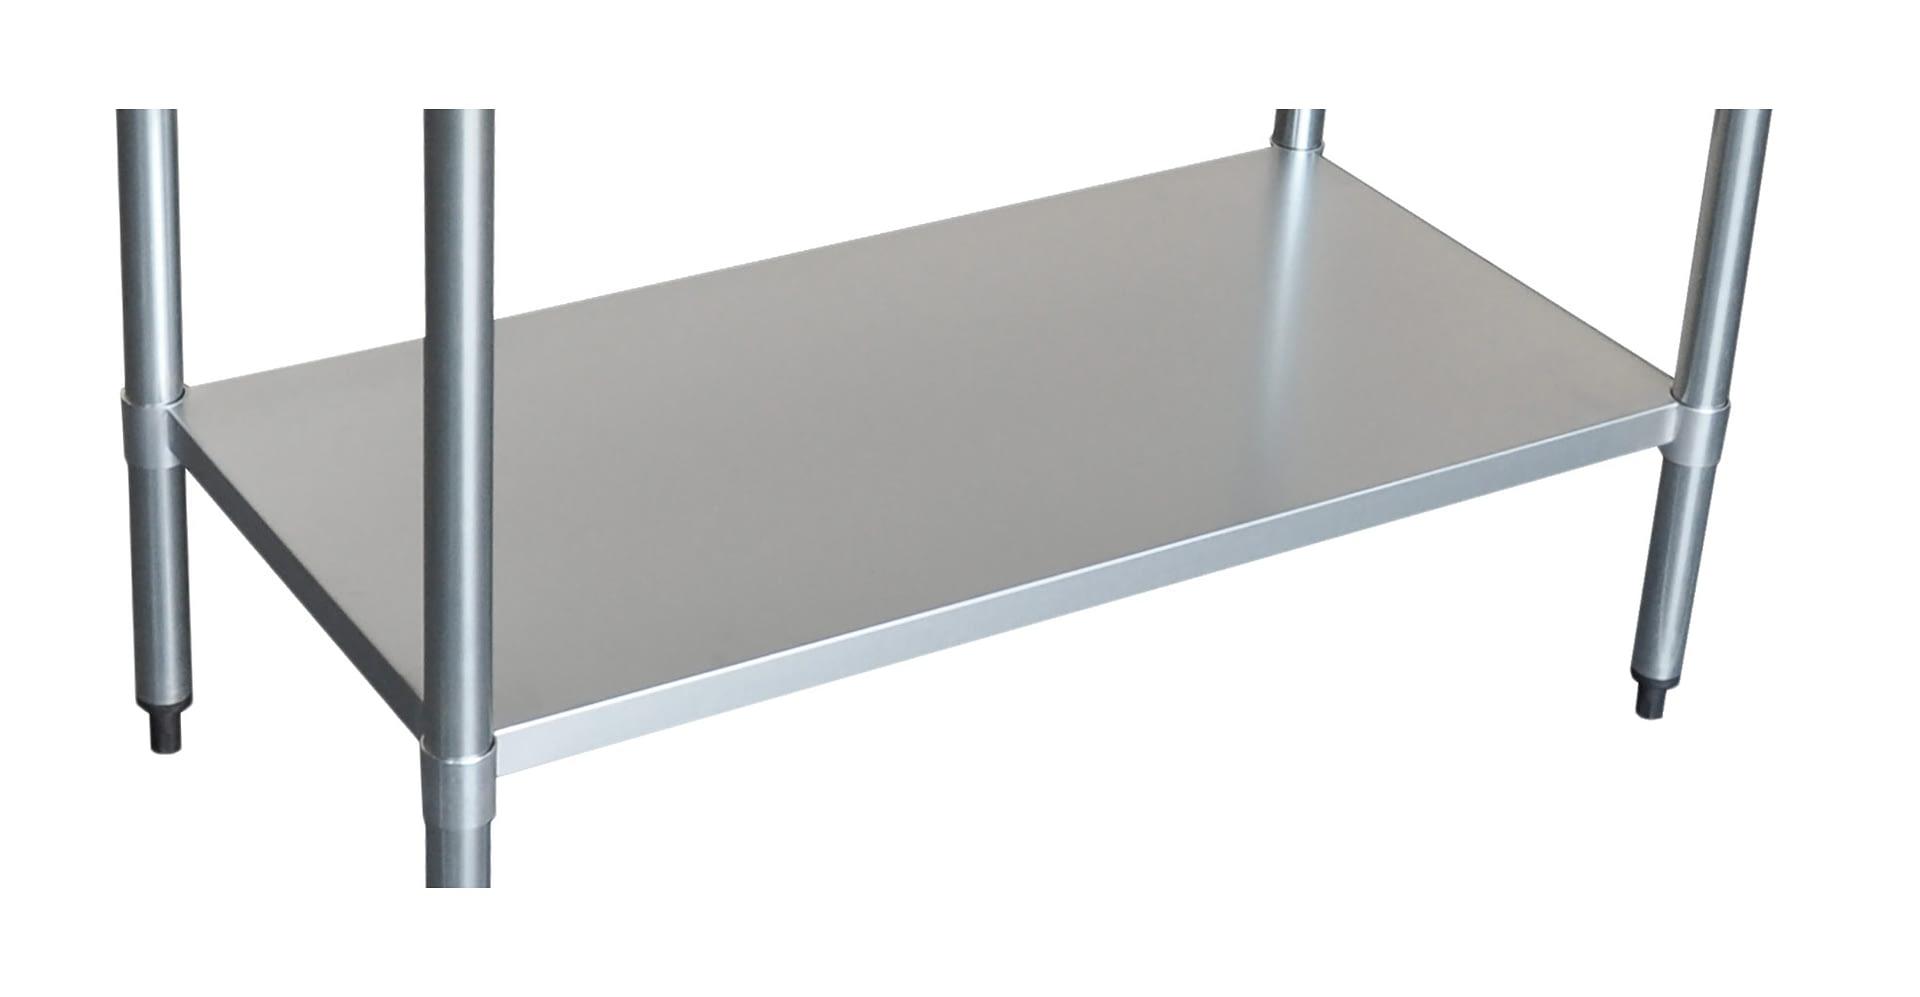 Stainless Undershelf for 2496 Bench